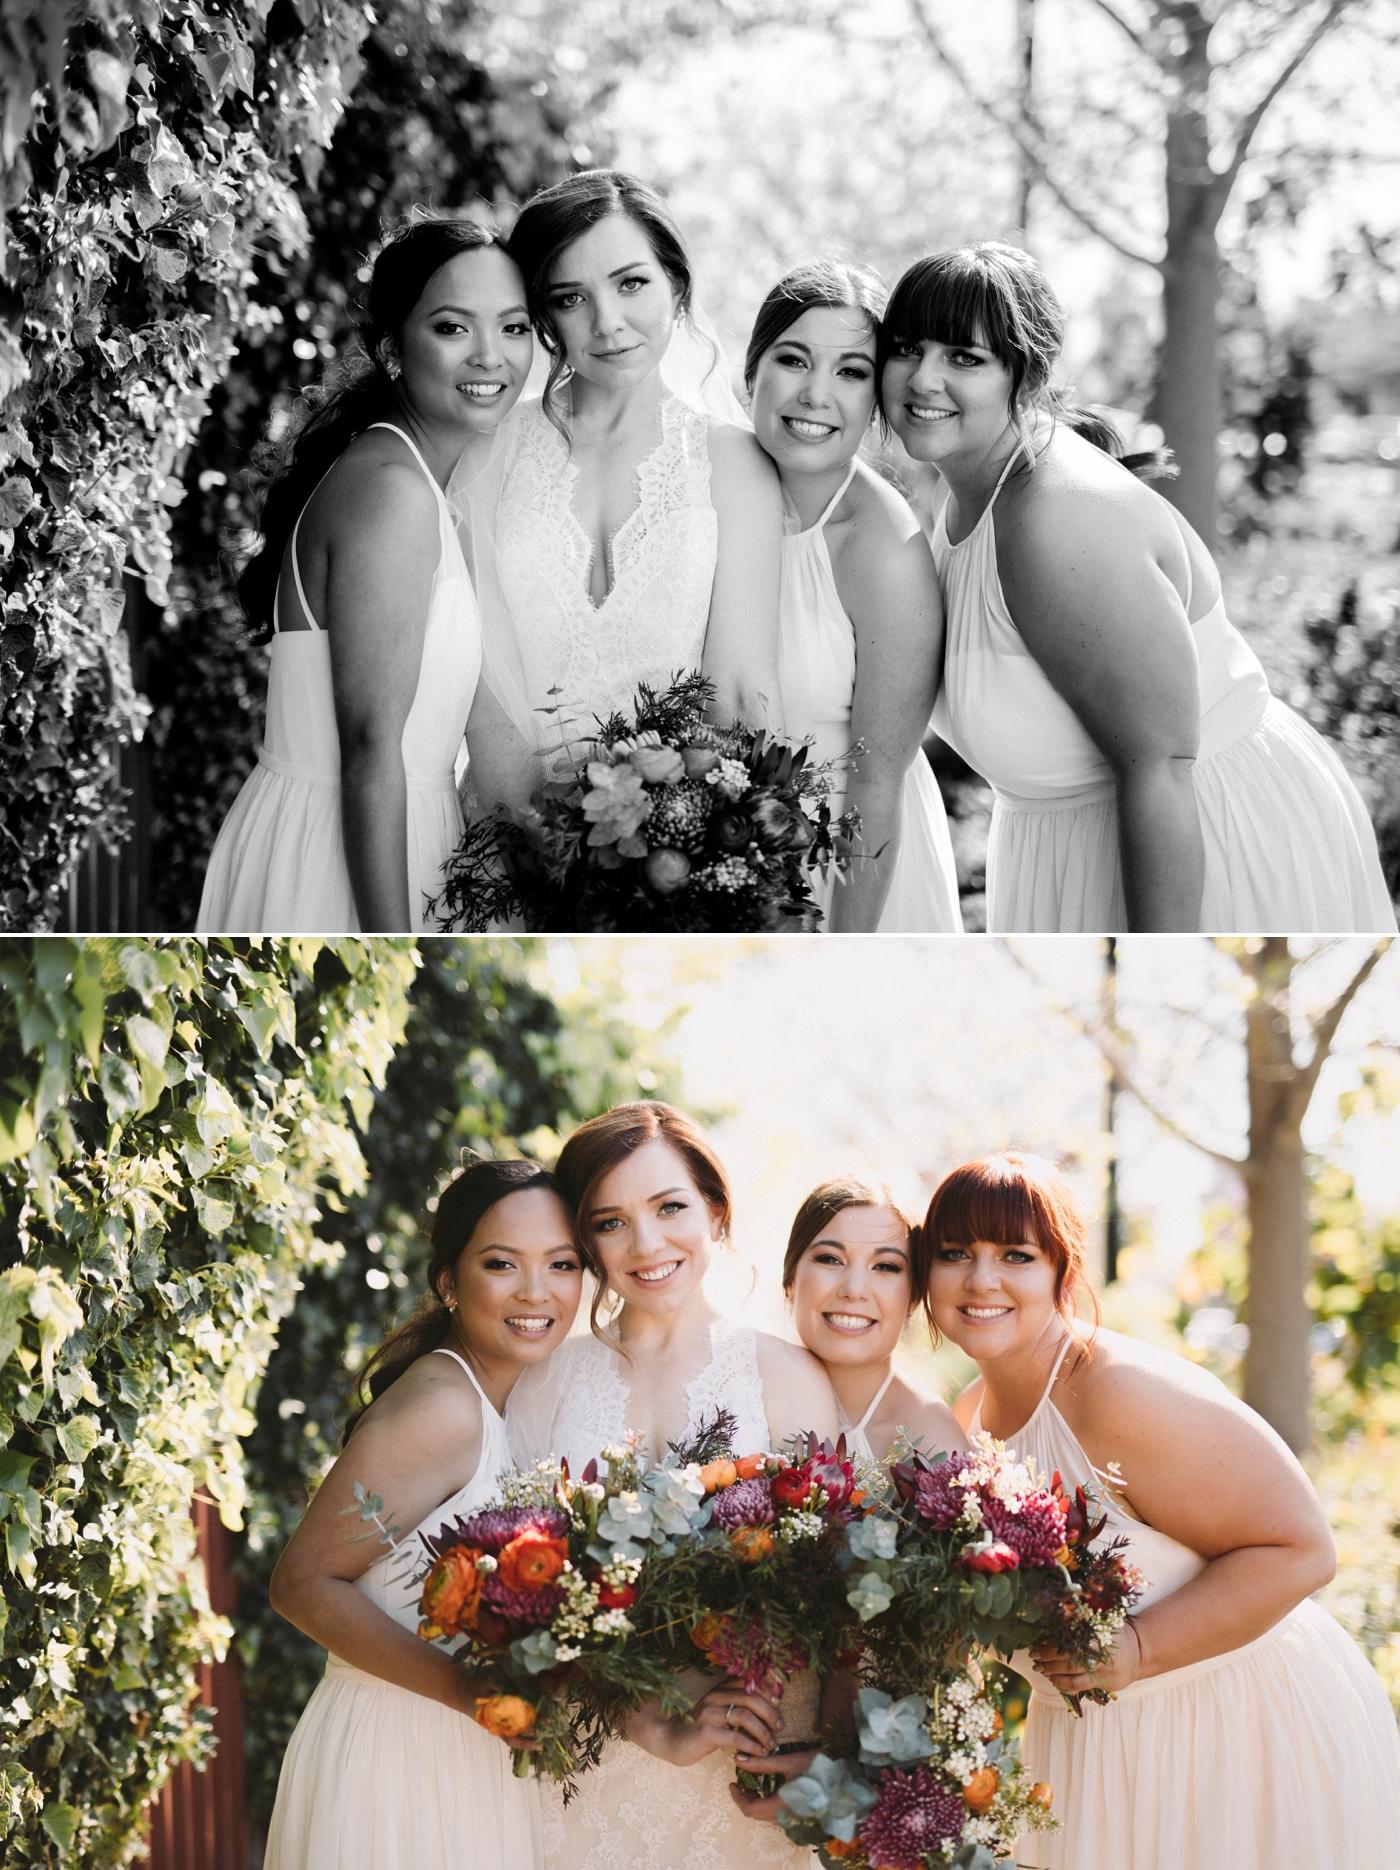 Erin & Ryan - Natural Wedding Photographer in Adelaide - Maximillians Wedding - Simple and Modern Wedding Photographer - Katherine Schultz - www.katherineschultzphotography.com_0033.jpg